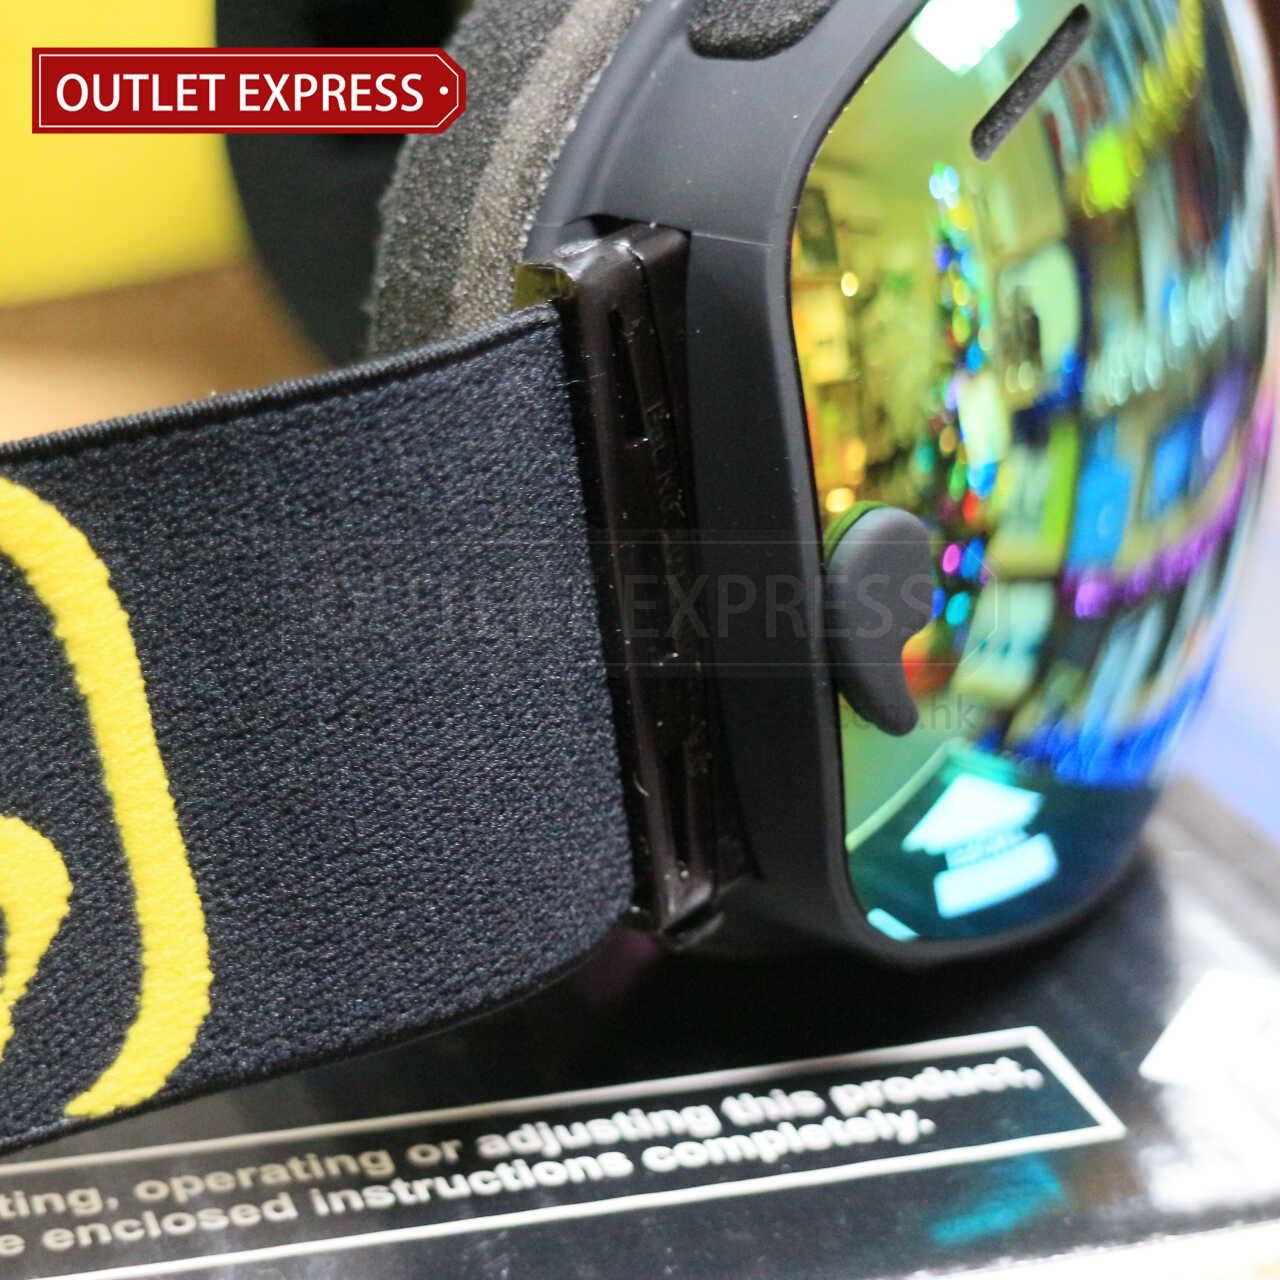 BENICE 大球面雙層防霧滑雪鏡 | 可配合眼鏡用 側邊-Outlet Express HK生活百貨城實拍相片